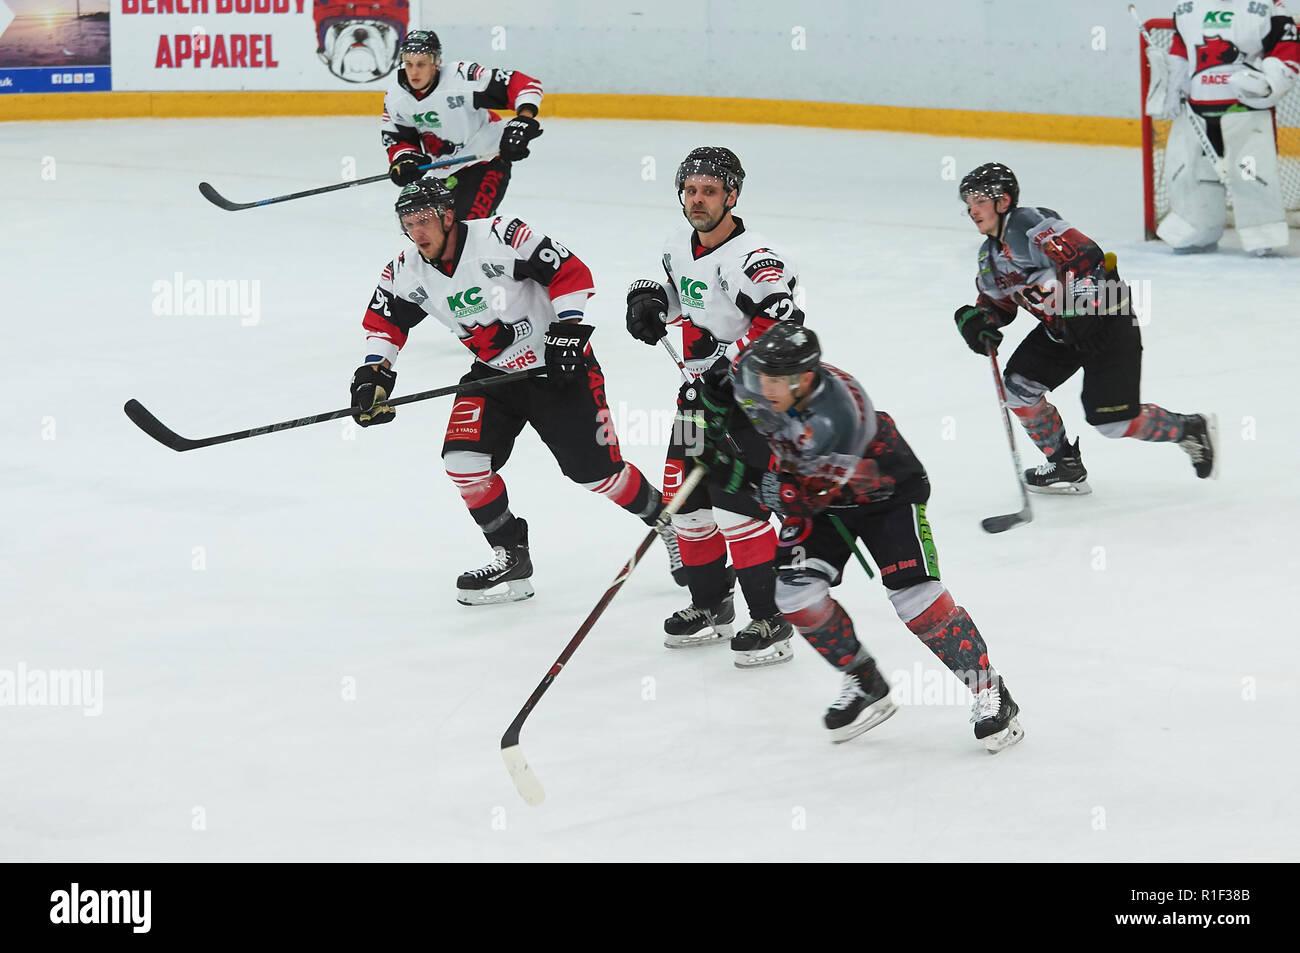 Action in an Ice Hockey Match dd46e8394dd